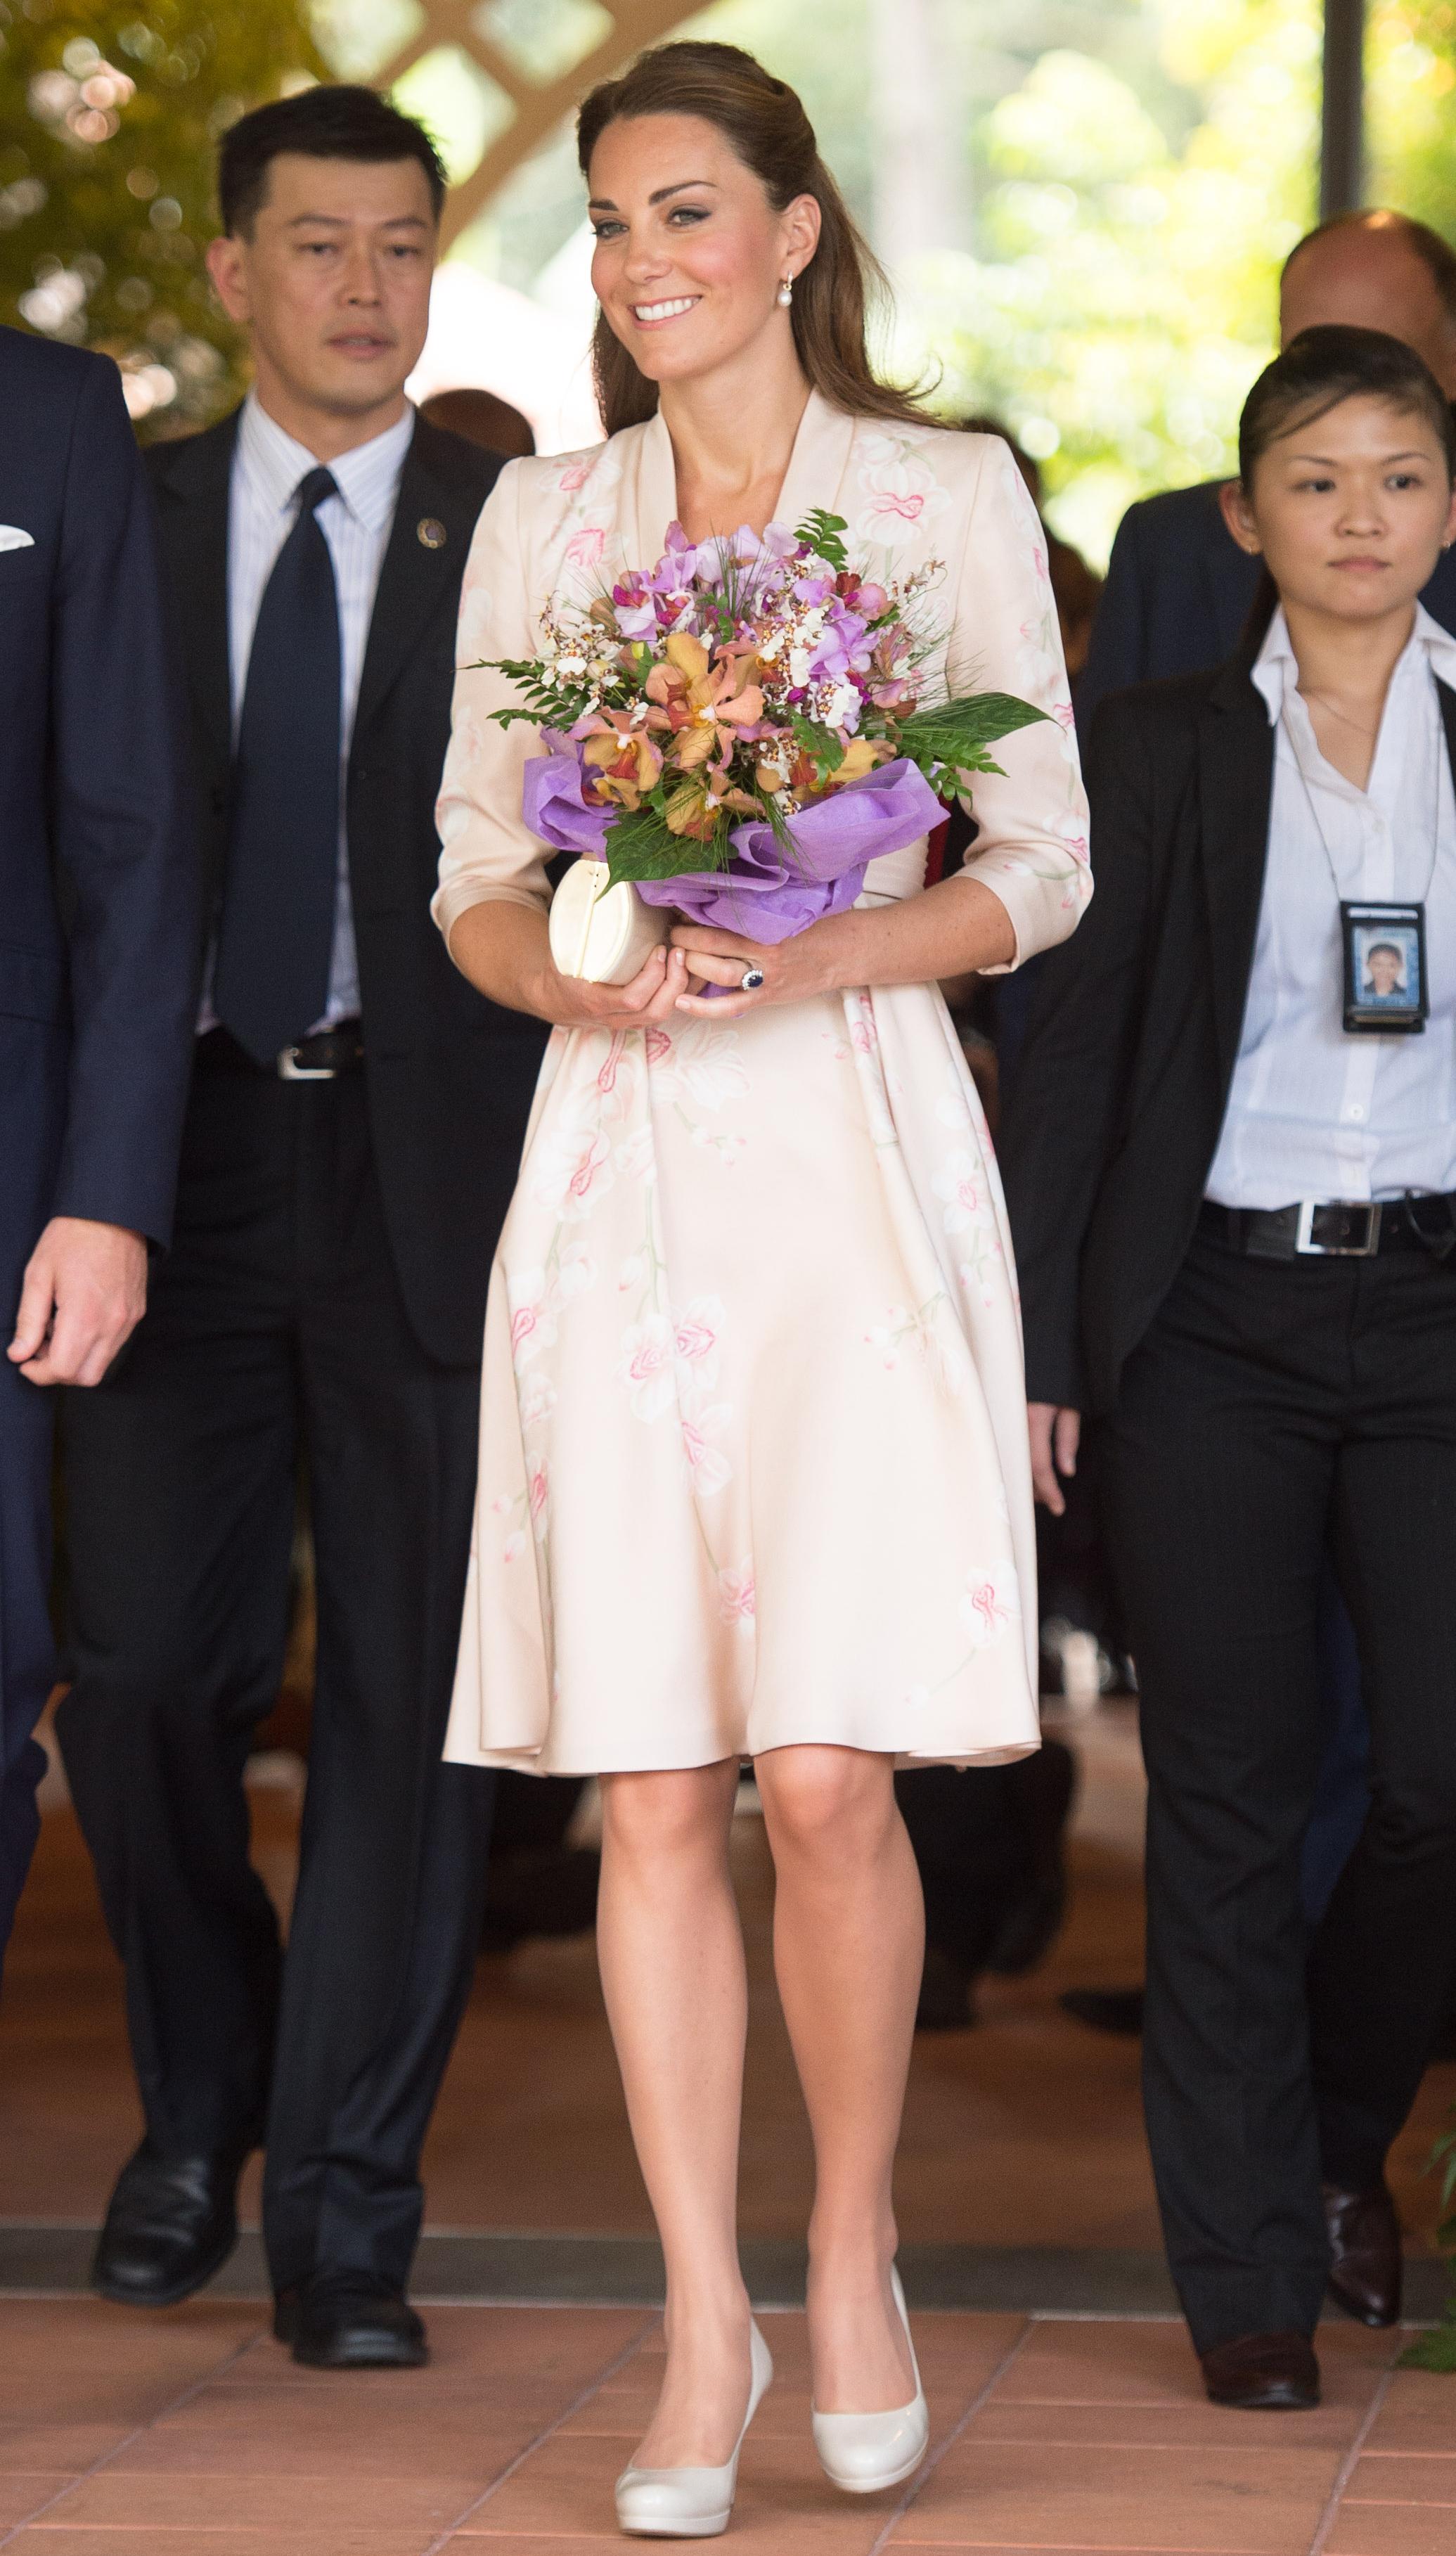 Duchess Kate naming ceremony